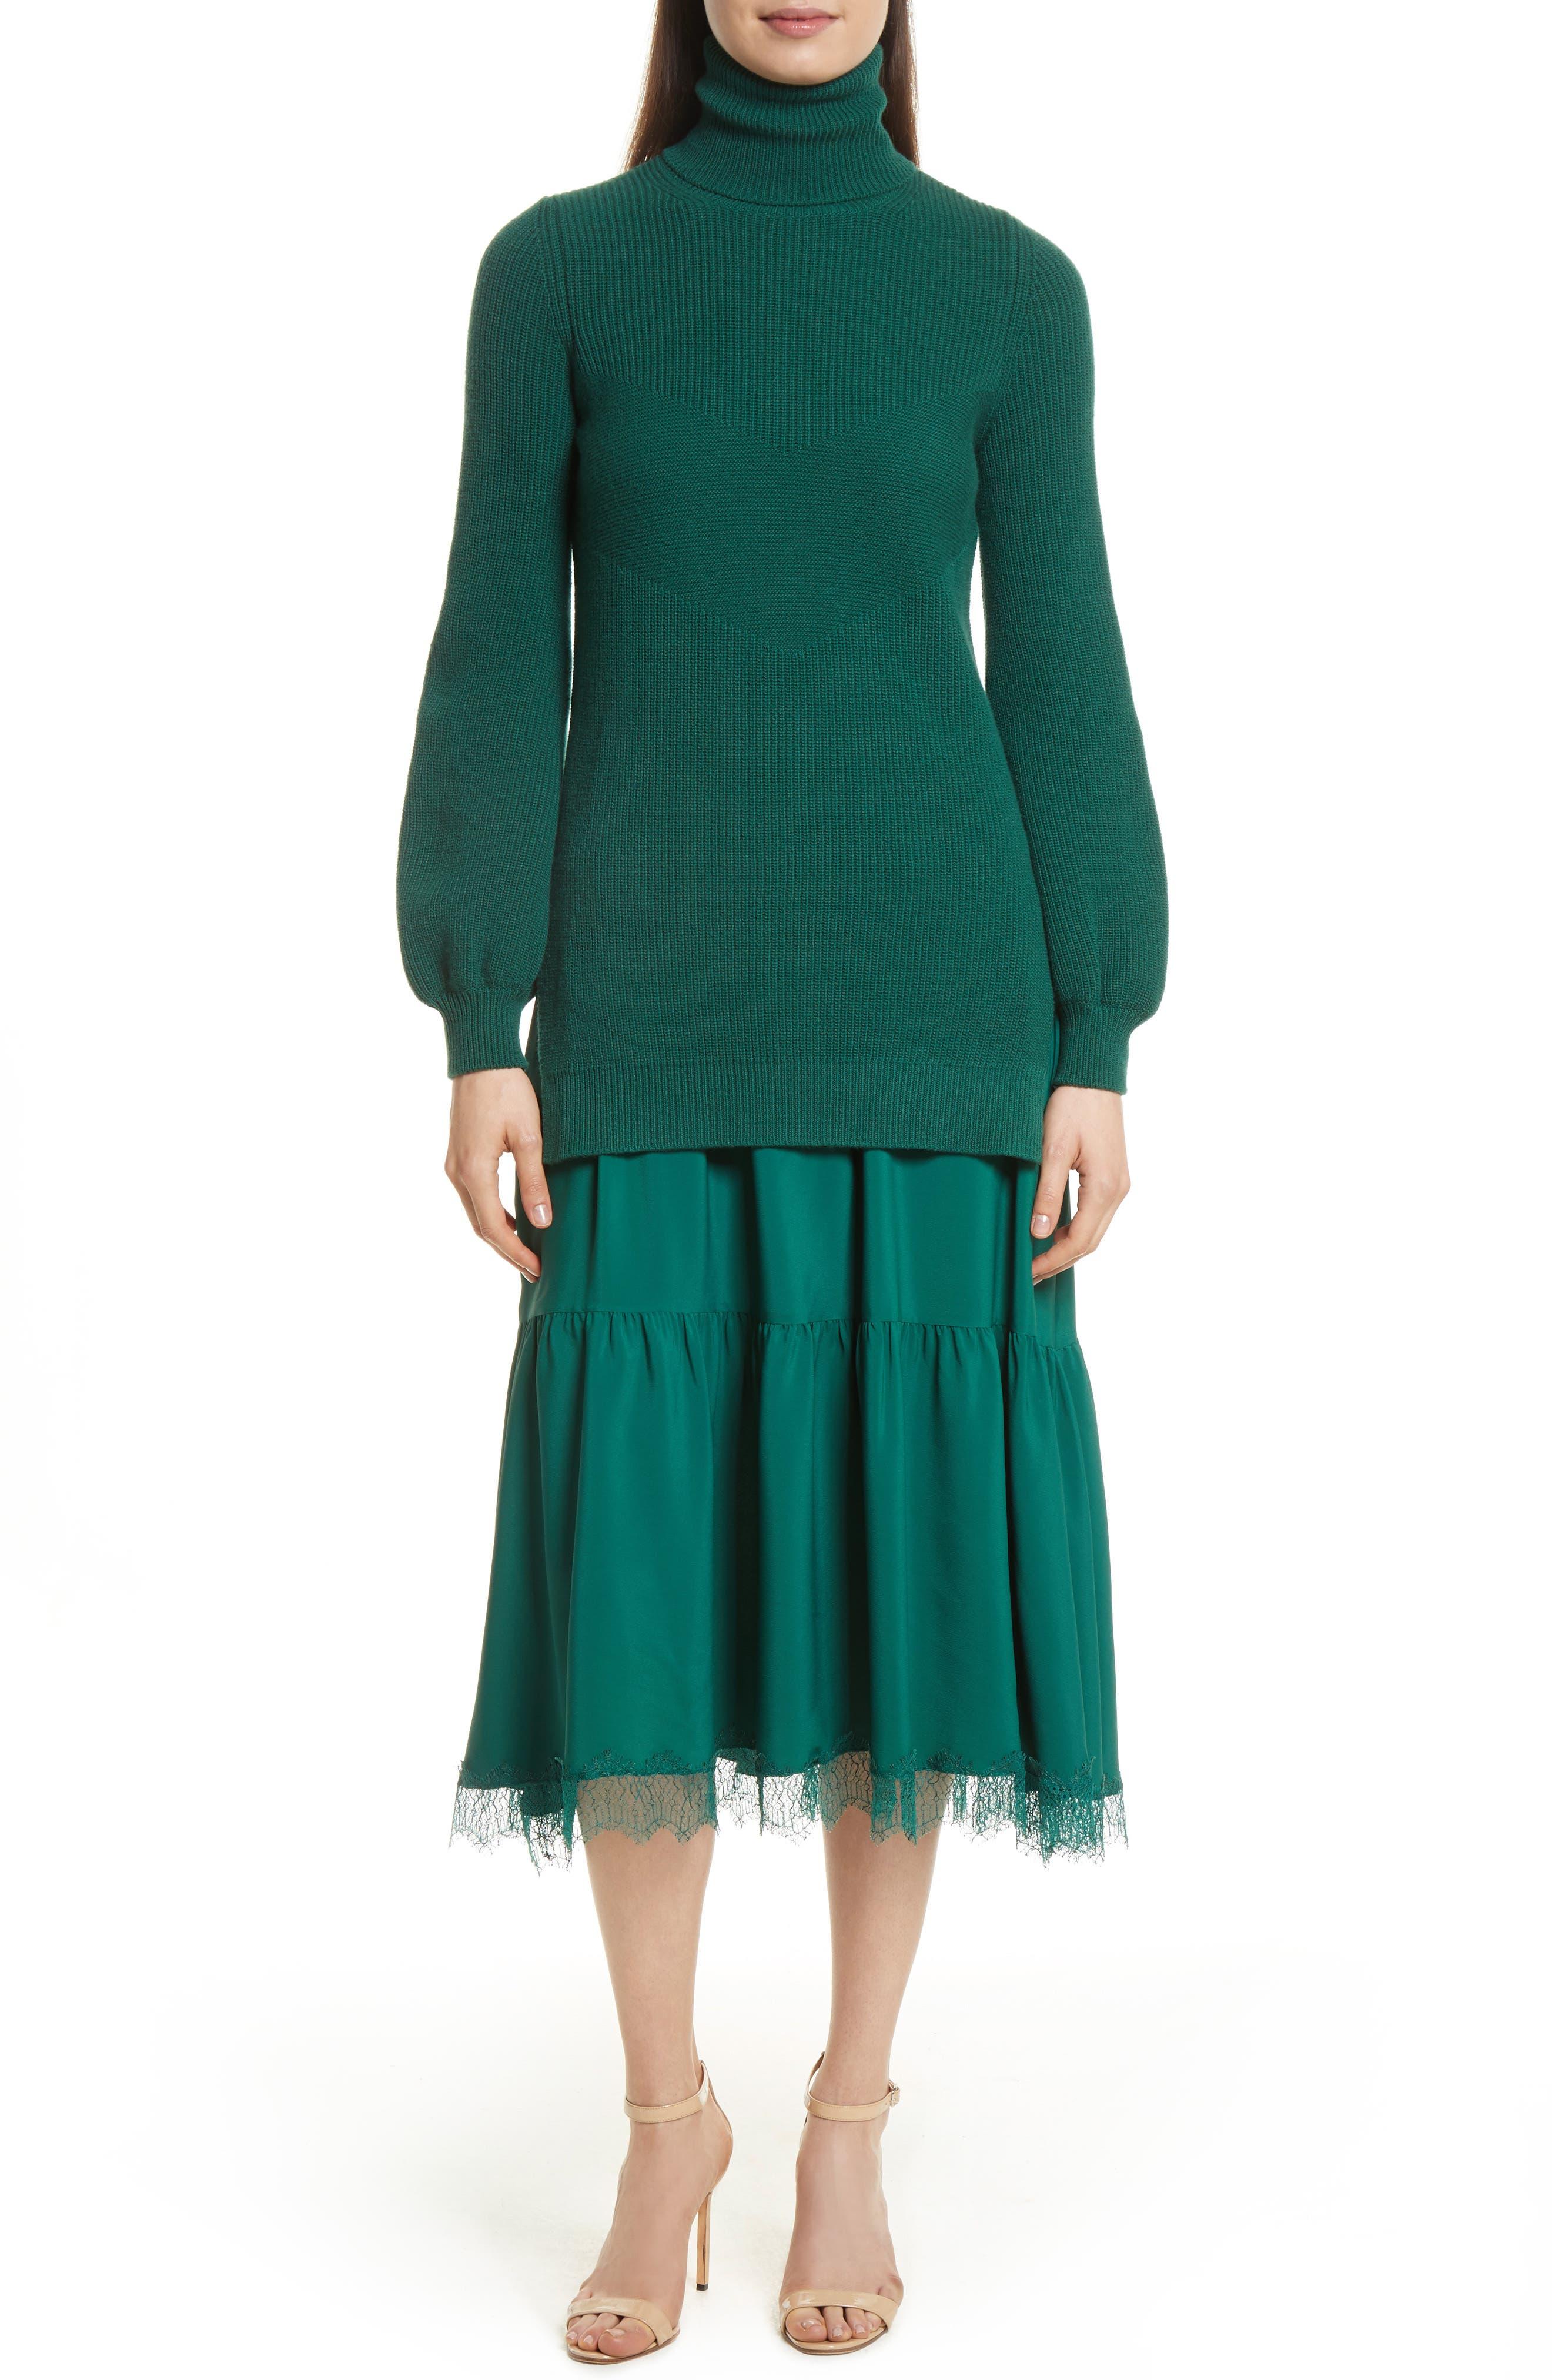 N°21 Lace Trim Dress